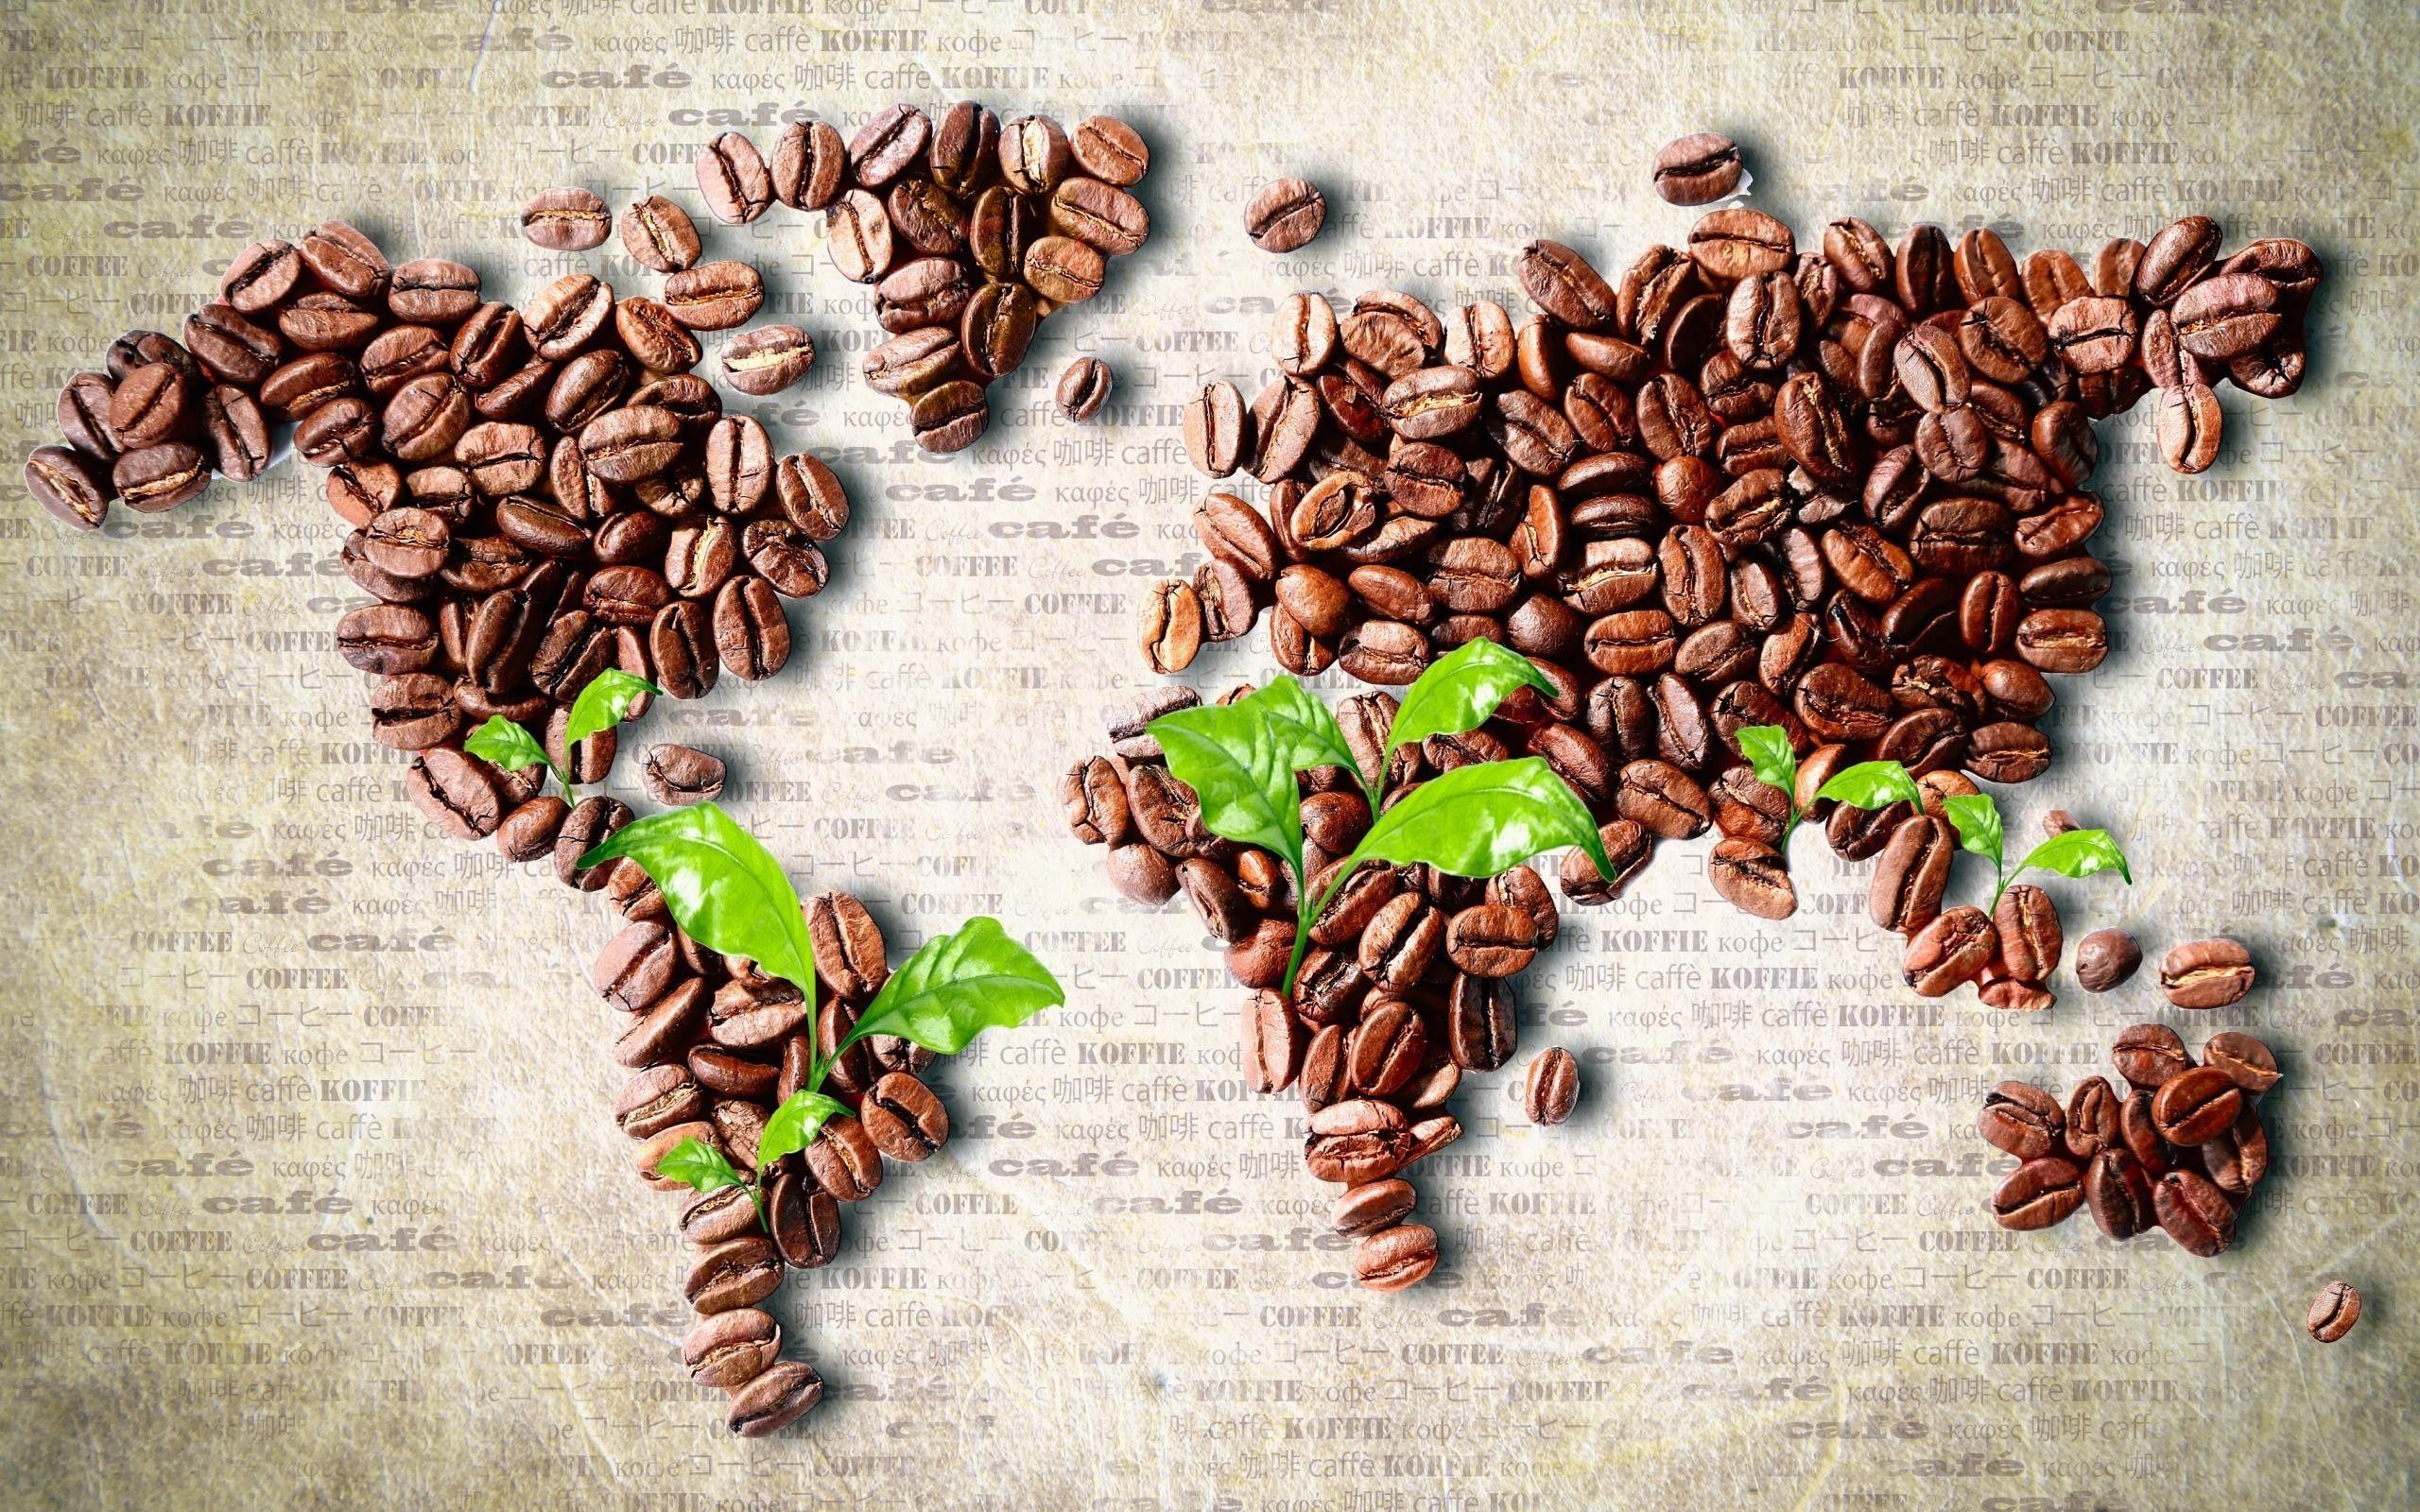 Картинка coffee beans, Листья, кофе в зернах, leaves, карта мира, continents, континенты, world map 2560x1600, фото 85152 | Кофе в зернах, Зерна, Кофе